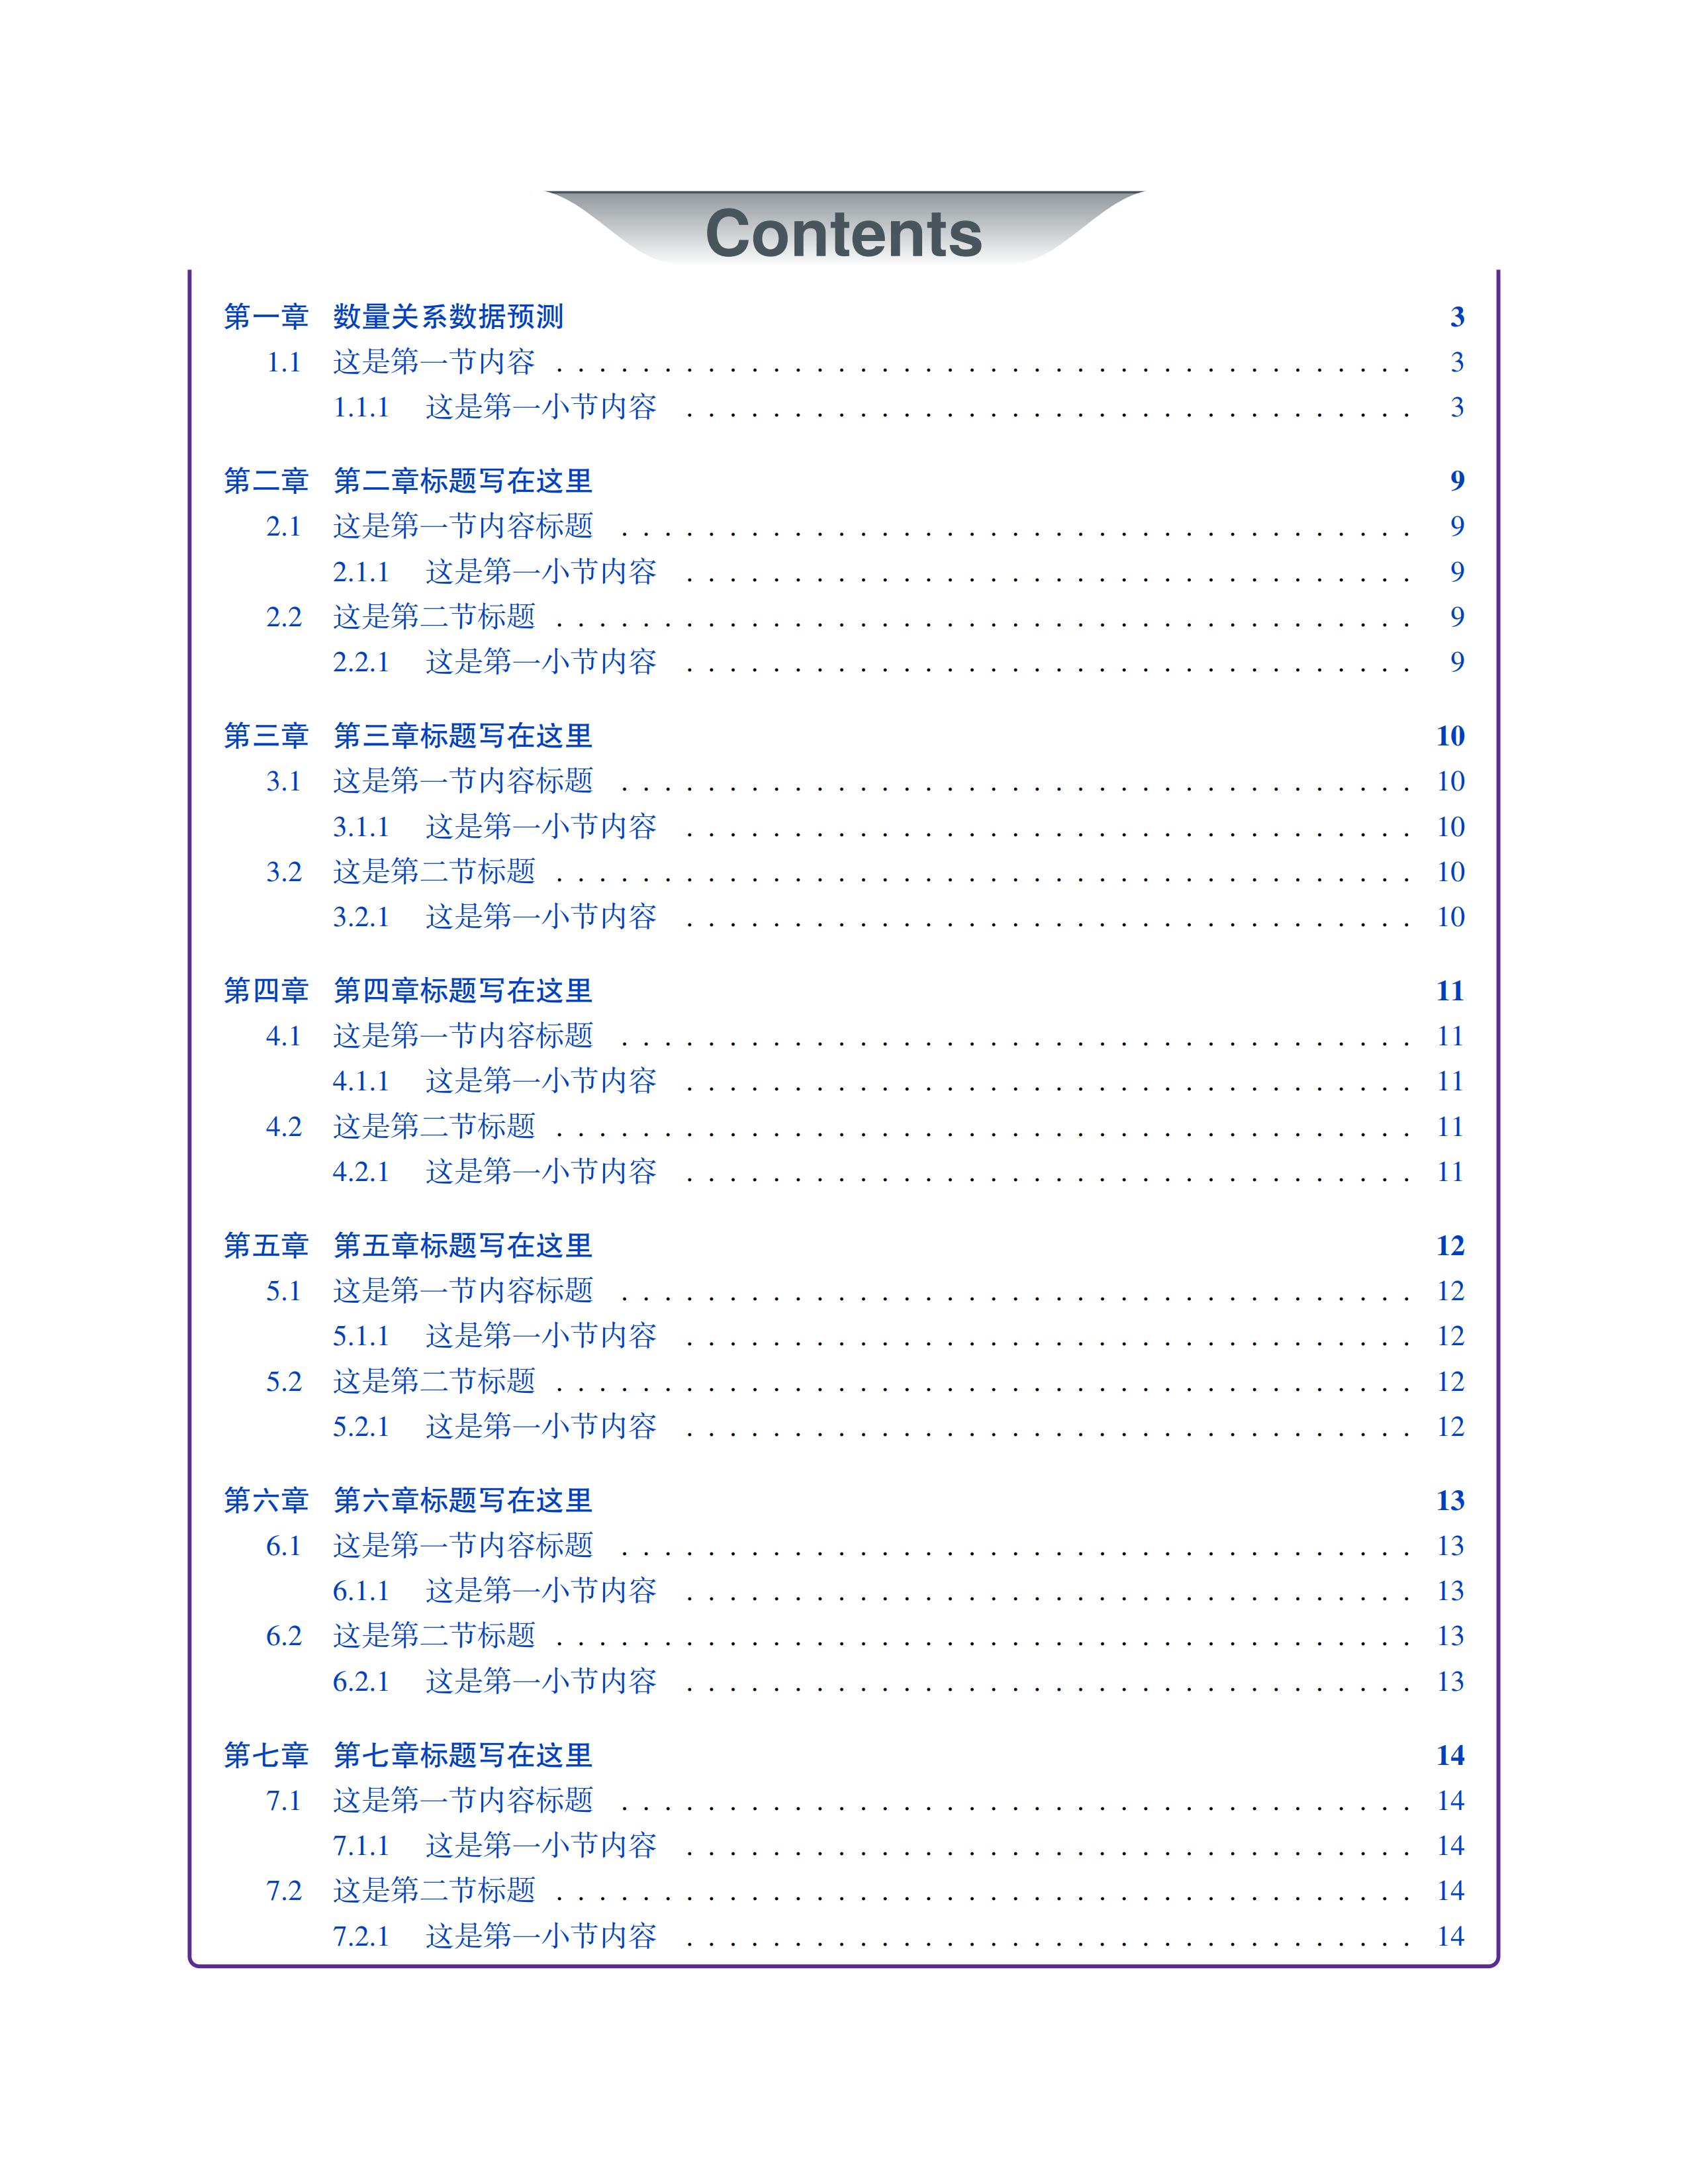 tcolorbox 制作章节目录和章节样式